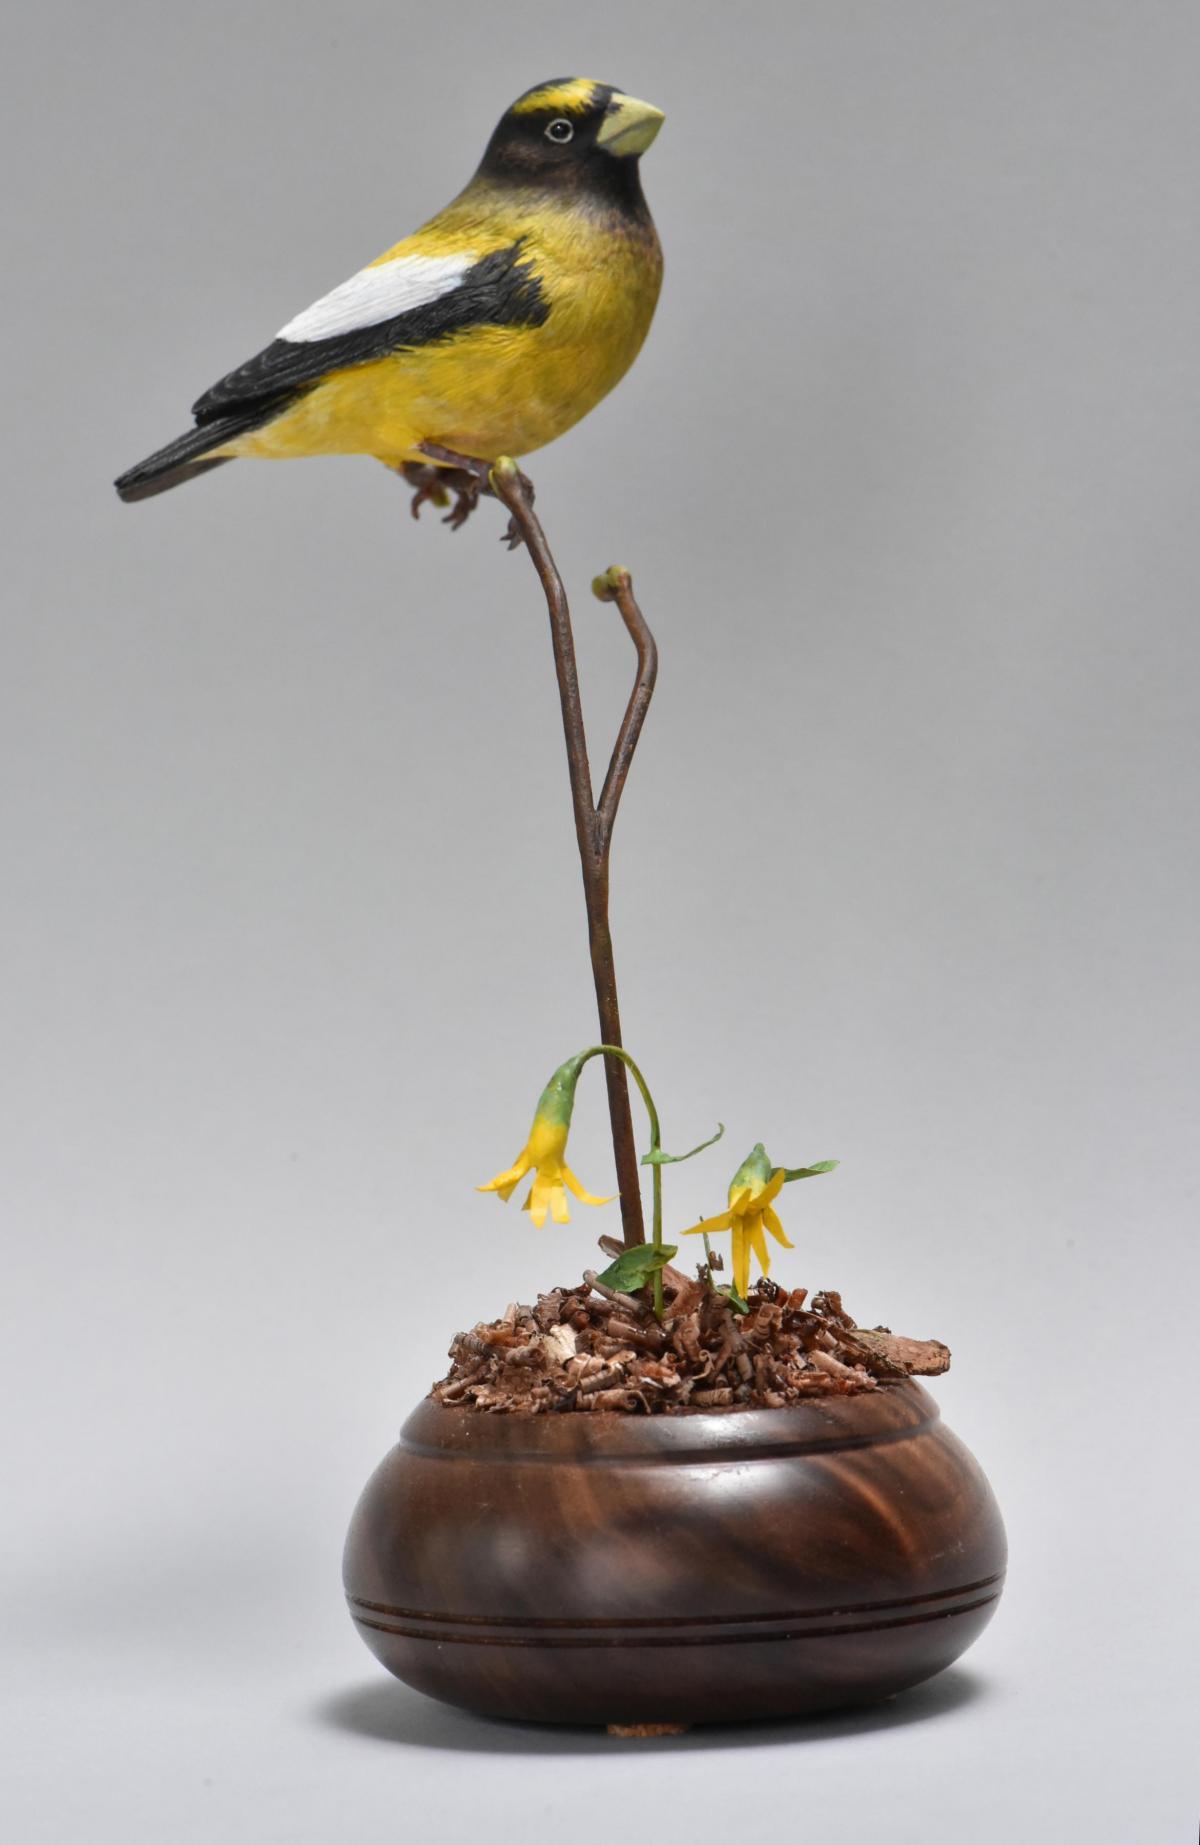 Joy   Sculpture by Uta Strelive   Artists for Conservation 2021